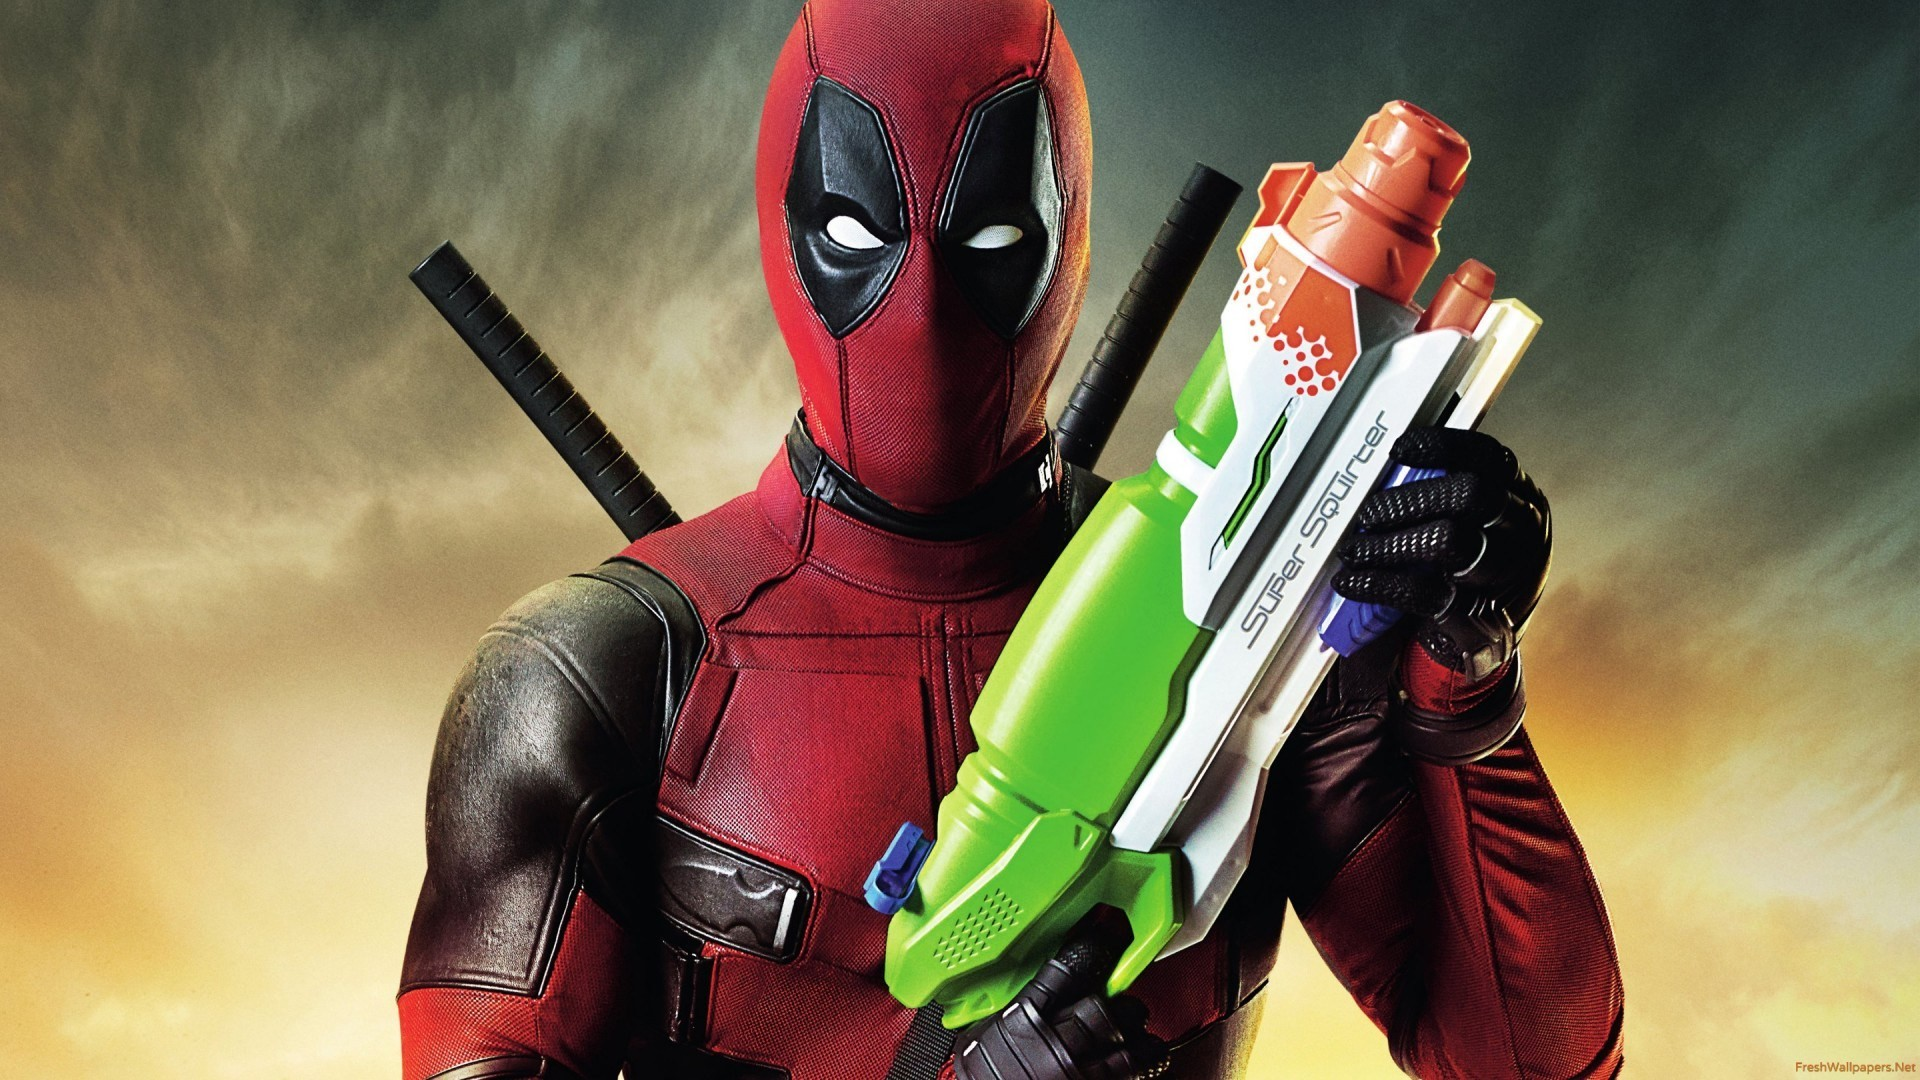 Res: 1920x1080, Superhero Marvel Deadpool (Movie) Deadpool 1080p HD Wallpaper Background